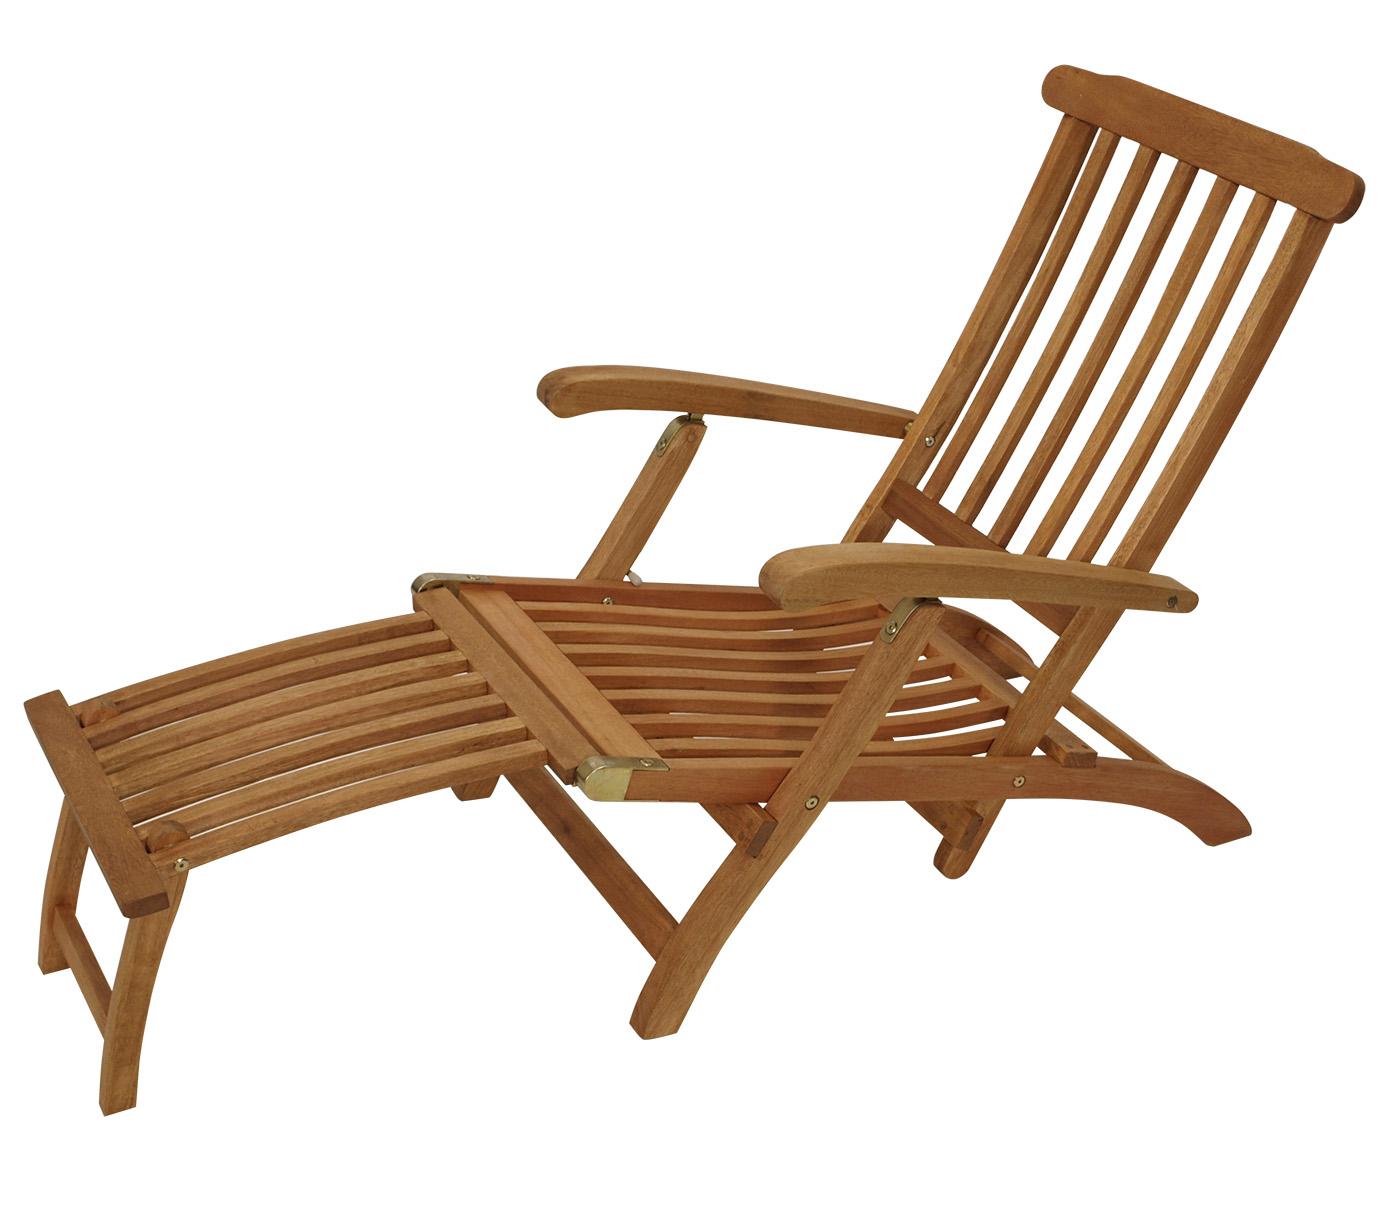 deckchair liegestuhl gartenm bel gartenliege steamer maine eukalyptus holz fsc ebay. Black Bedroom Furniture Sets. Home Design Ideas